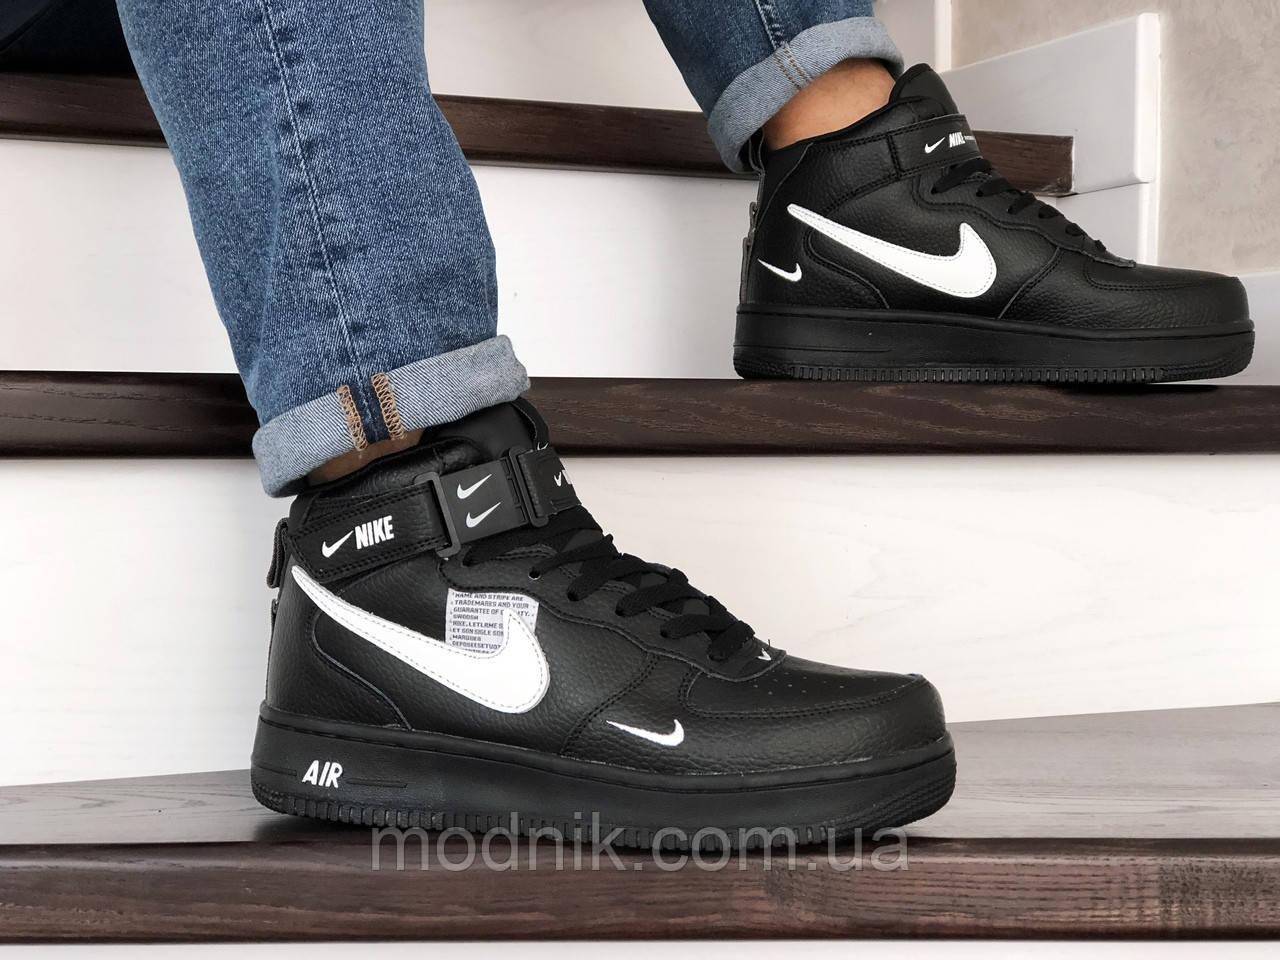 Мужские кроссовки Nike Air Force (черно-белые)